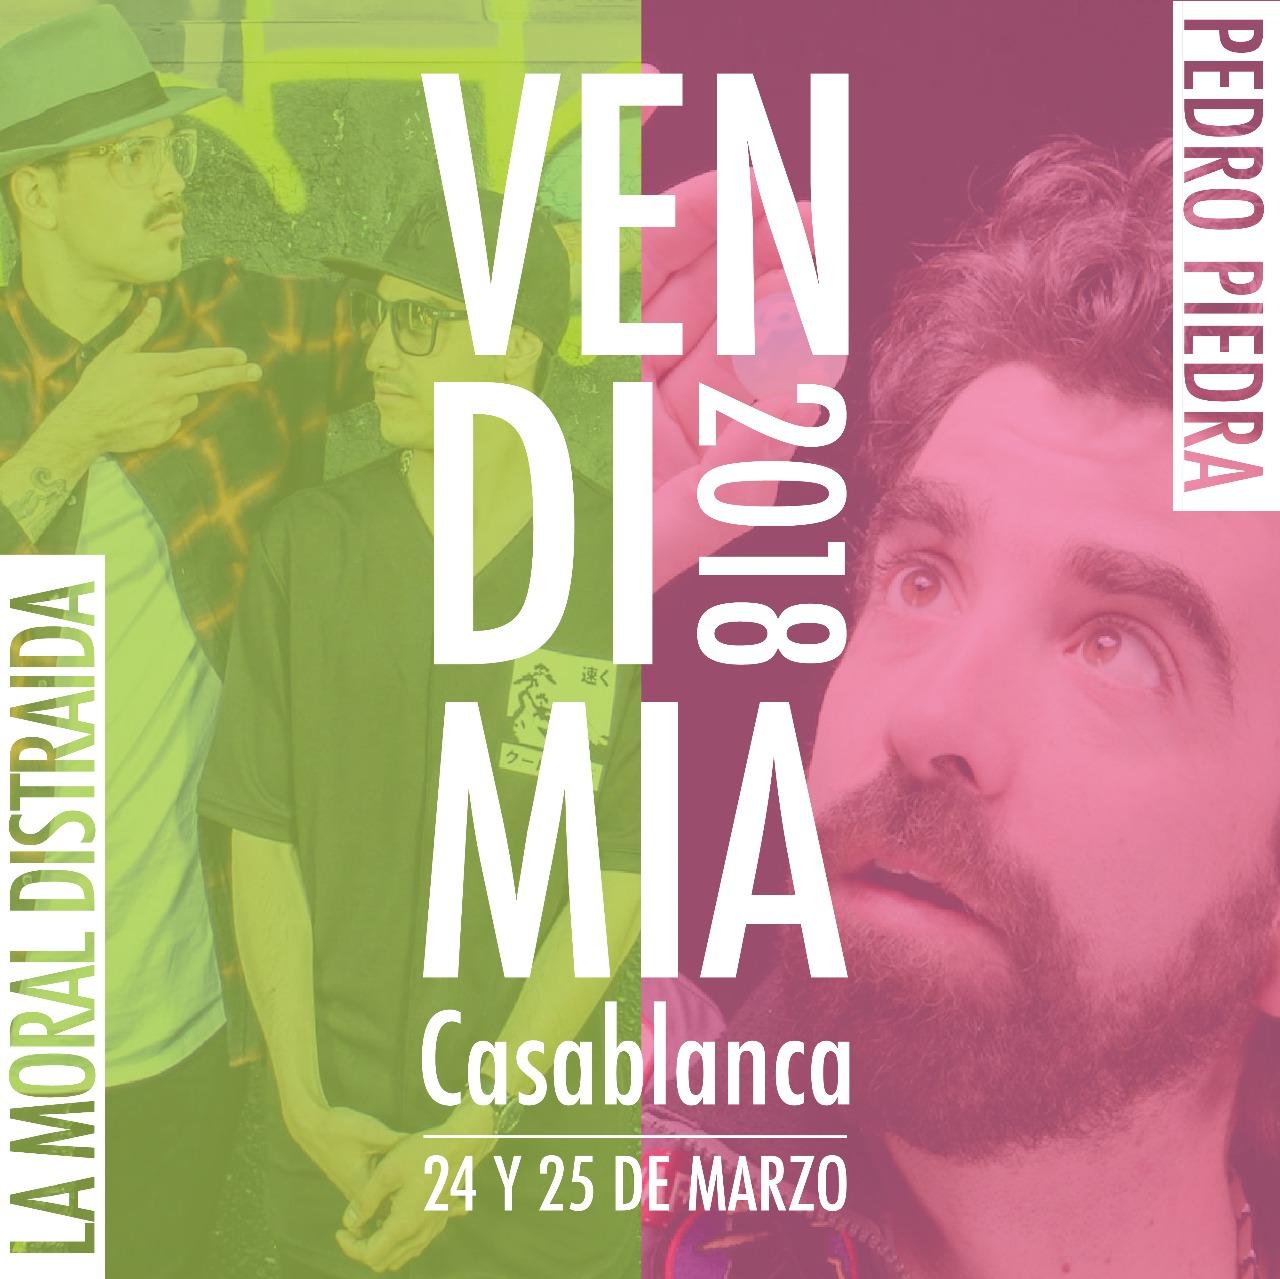 Casablanca se prepara para la VI Fiesta de la Vendimia.